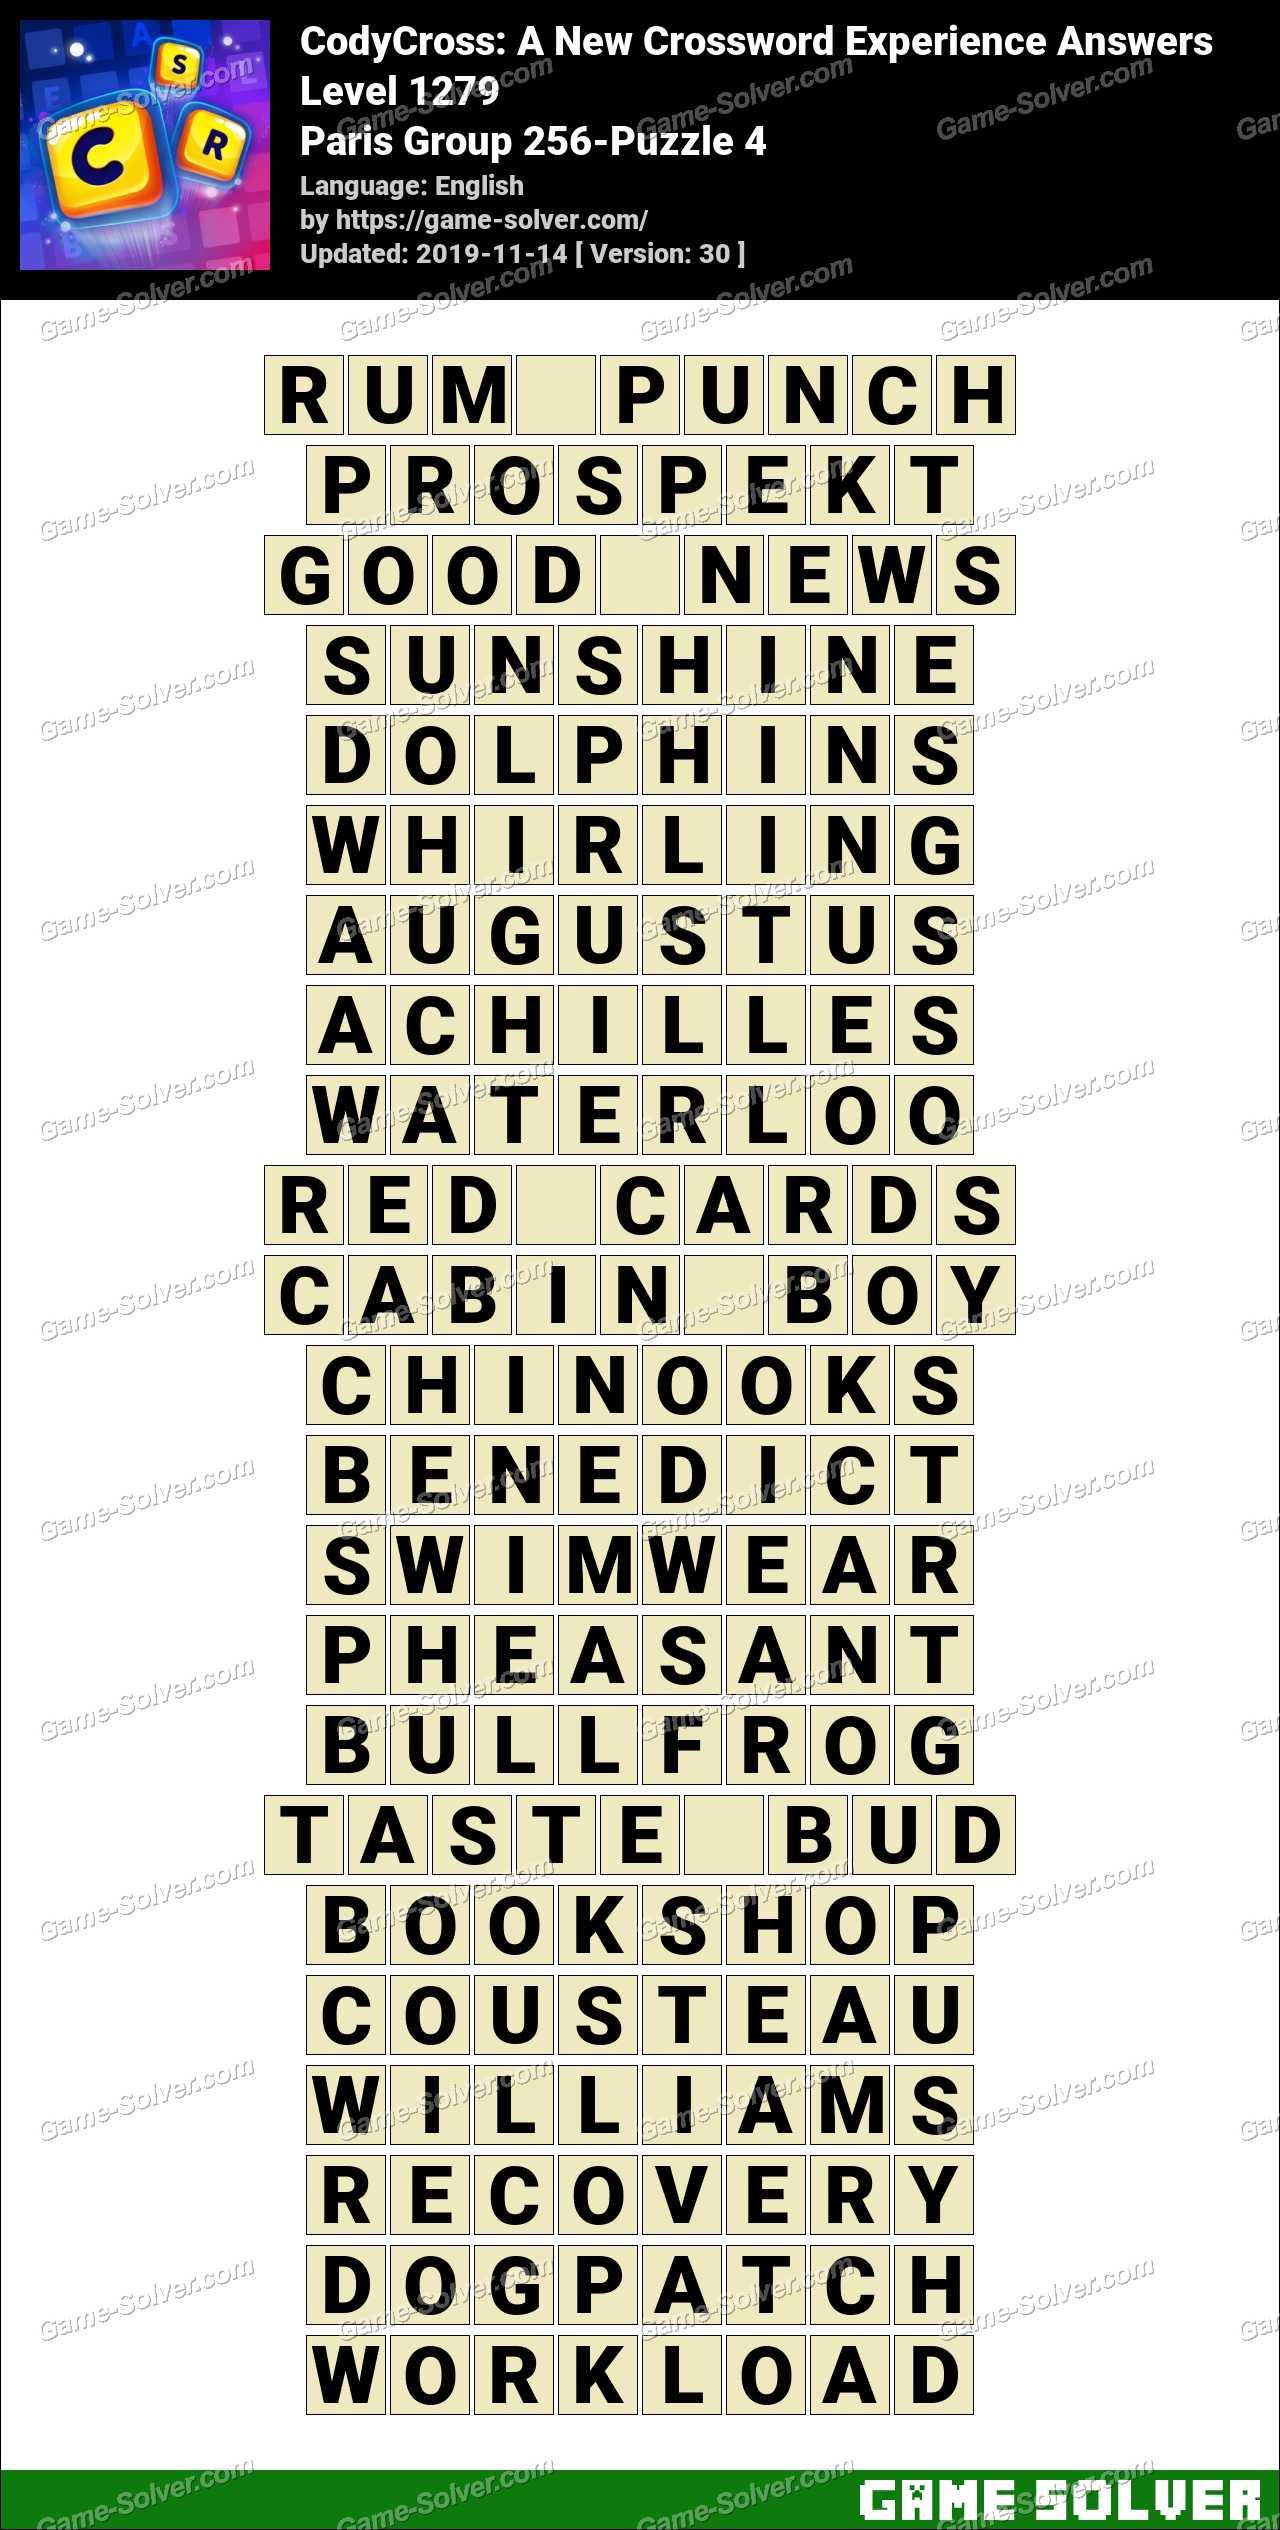 CodyCross Paris Group 256-Puzzle 4 Answers